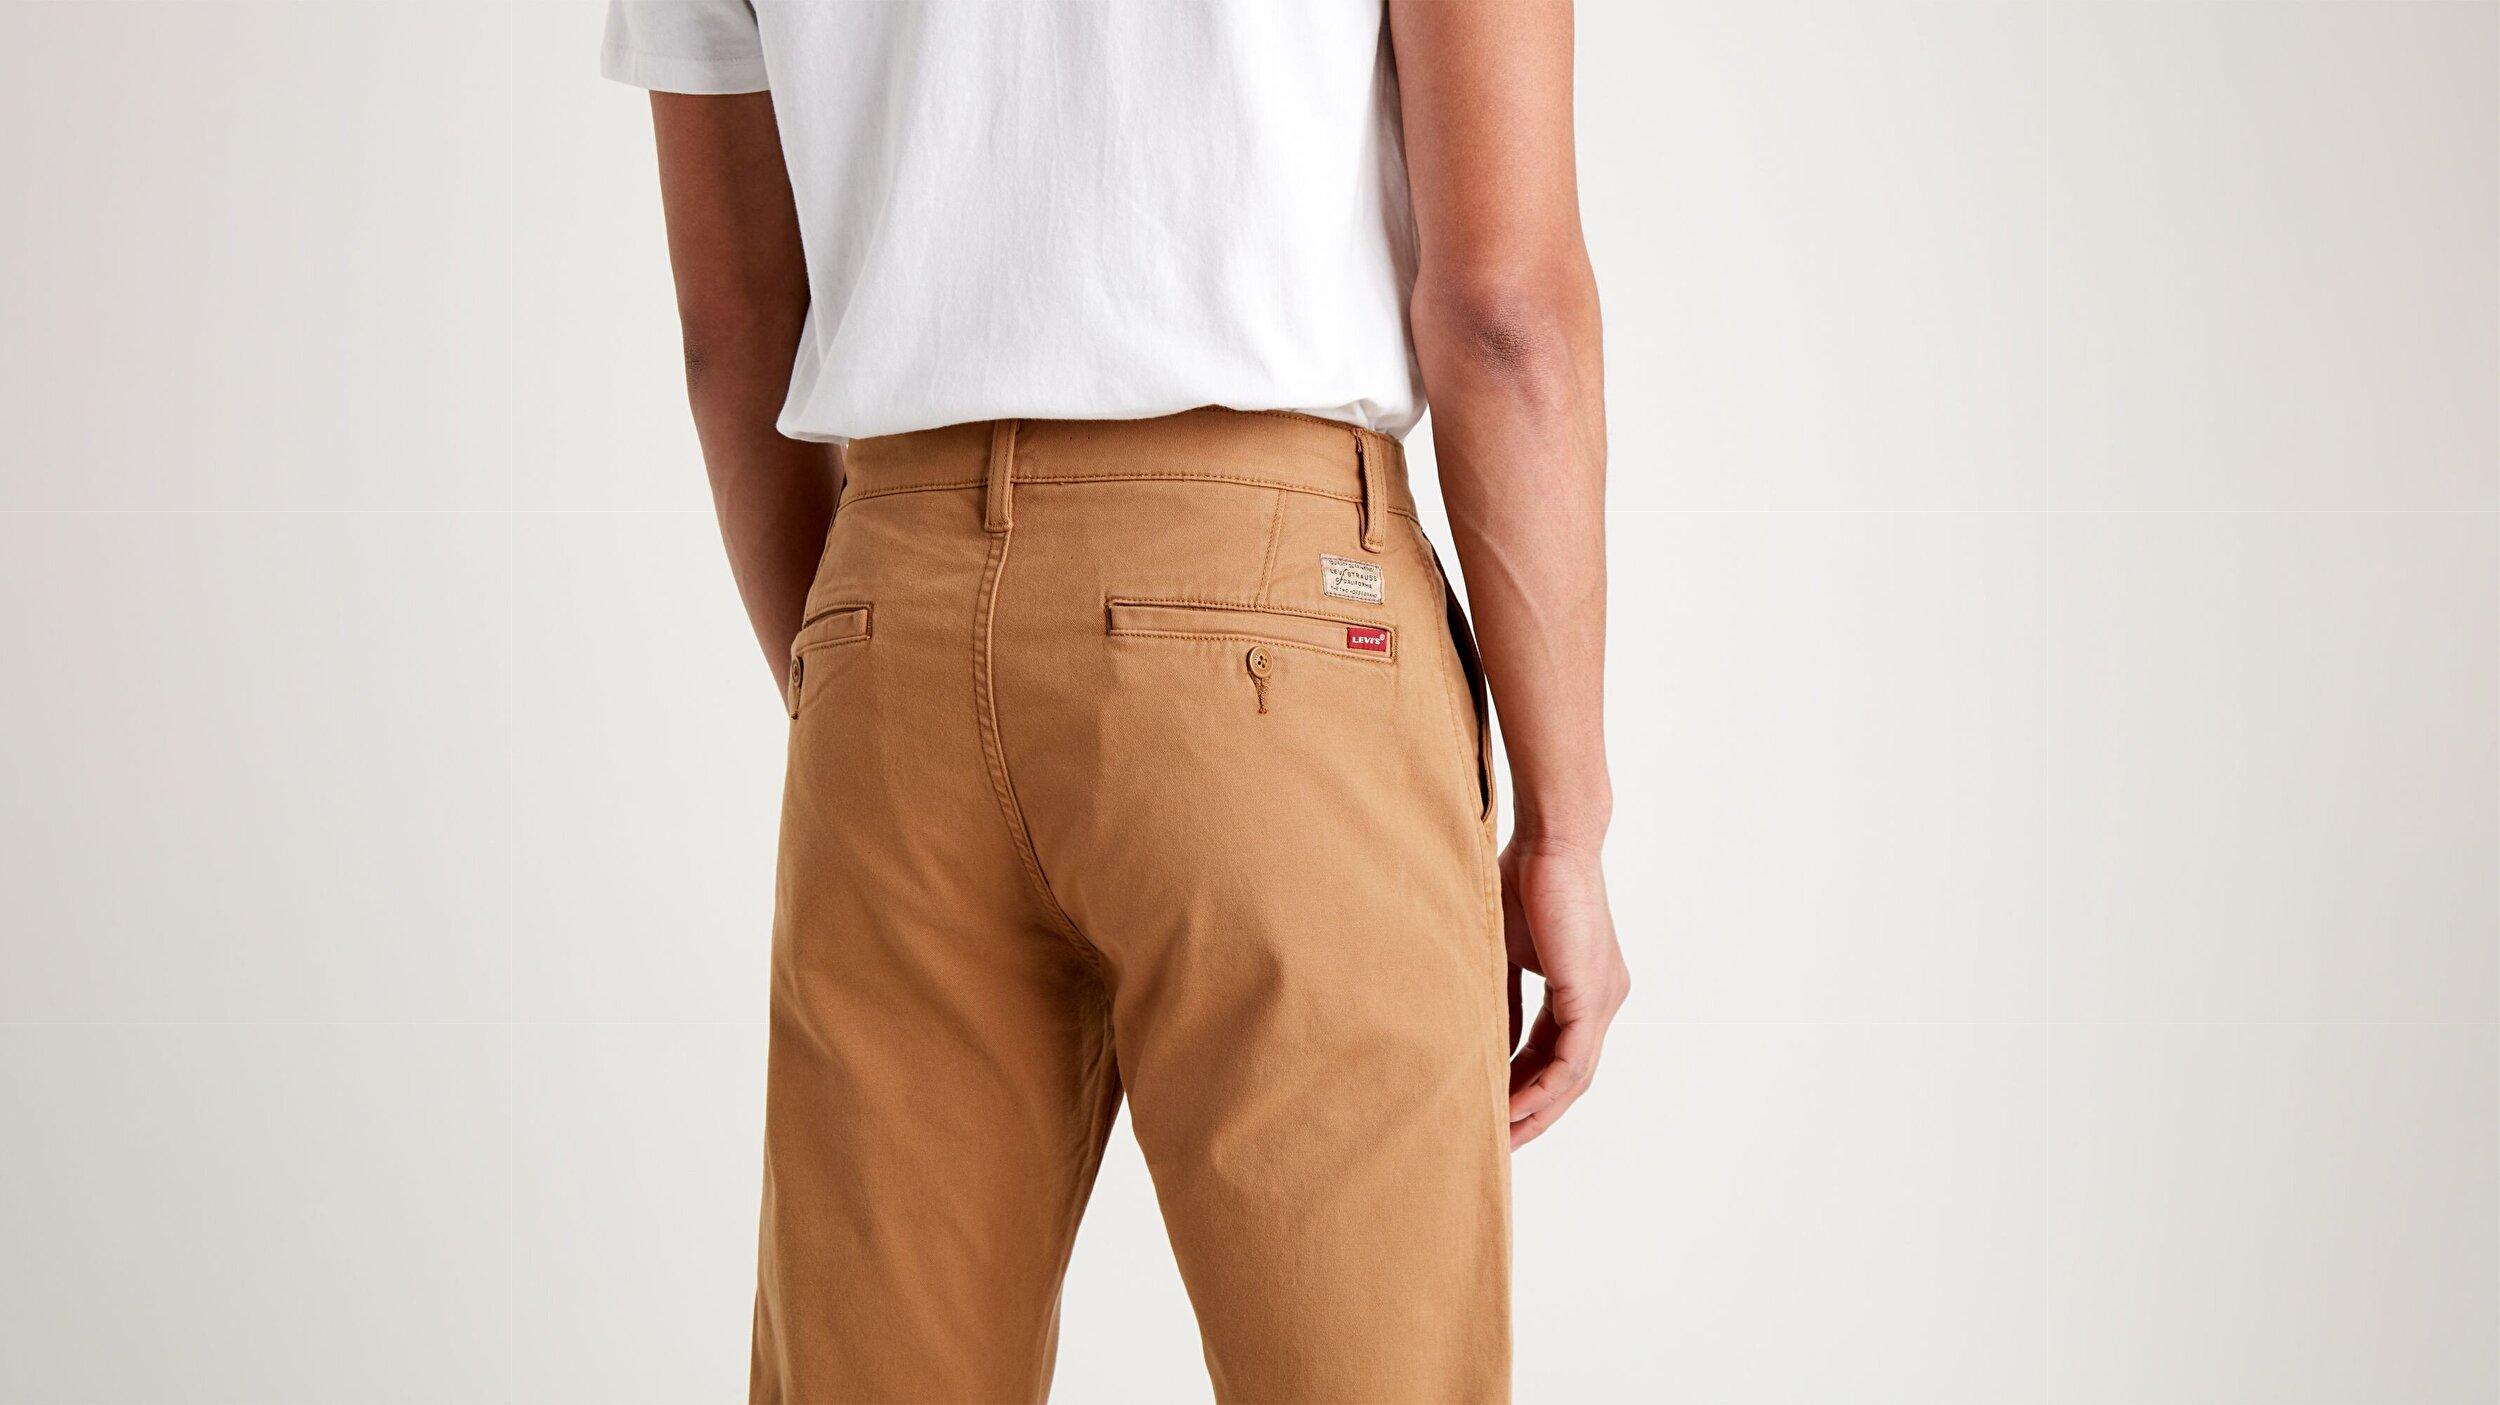 XX Chino Düz Kesim Erkek Pantolon-Desert Boots Shady Gd Ccu B